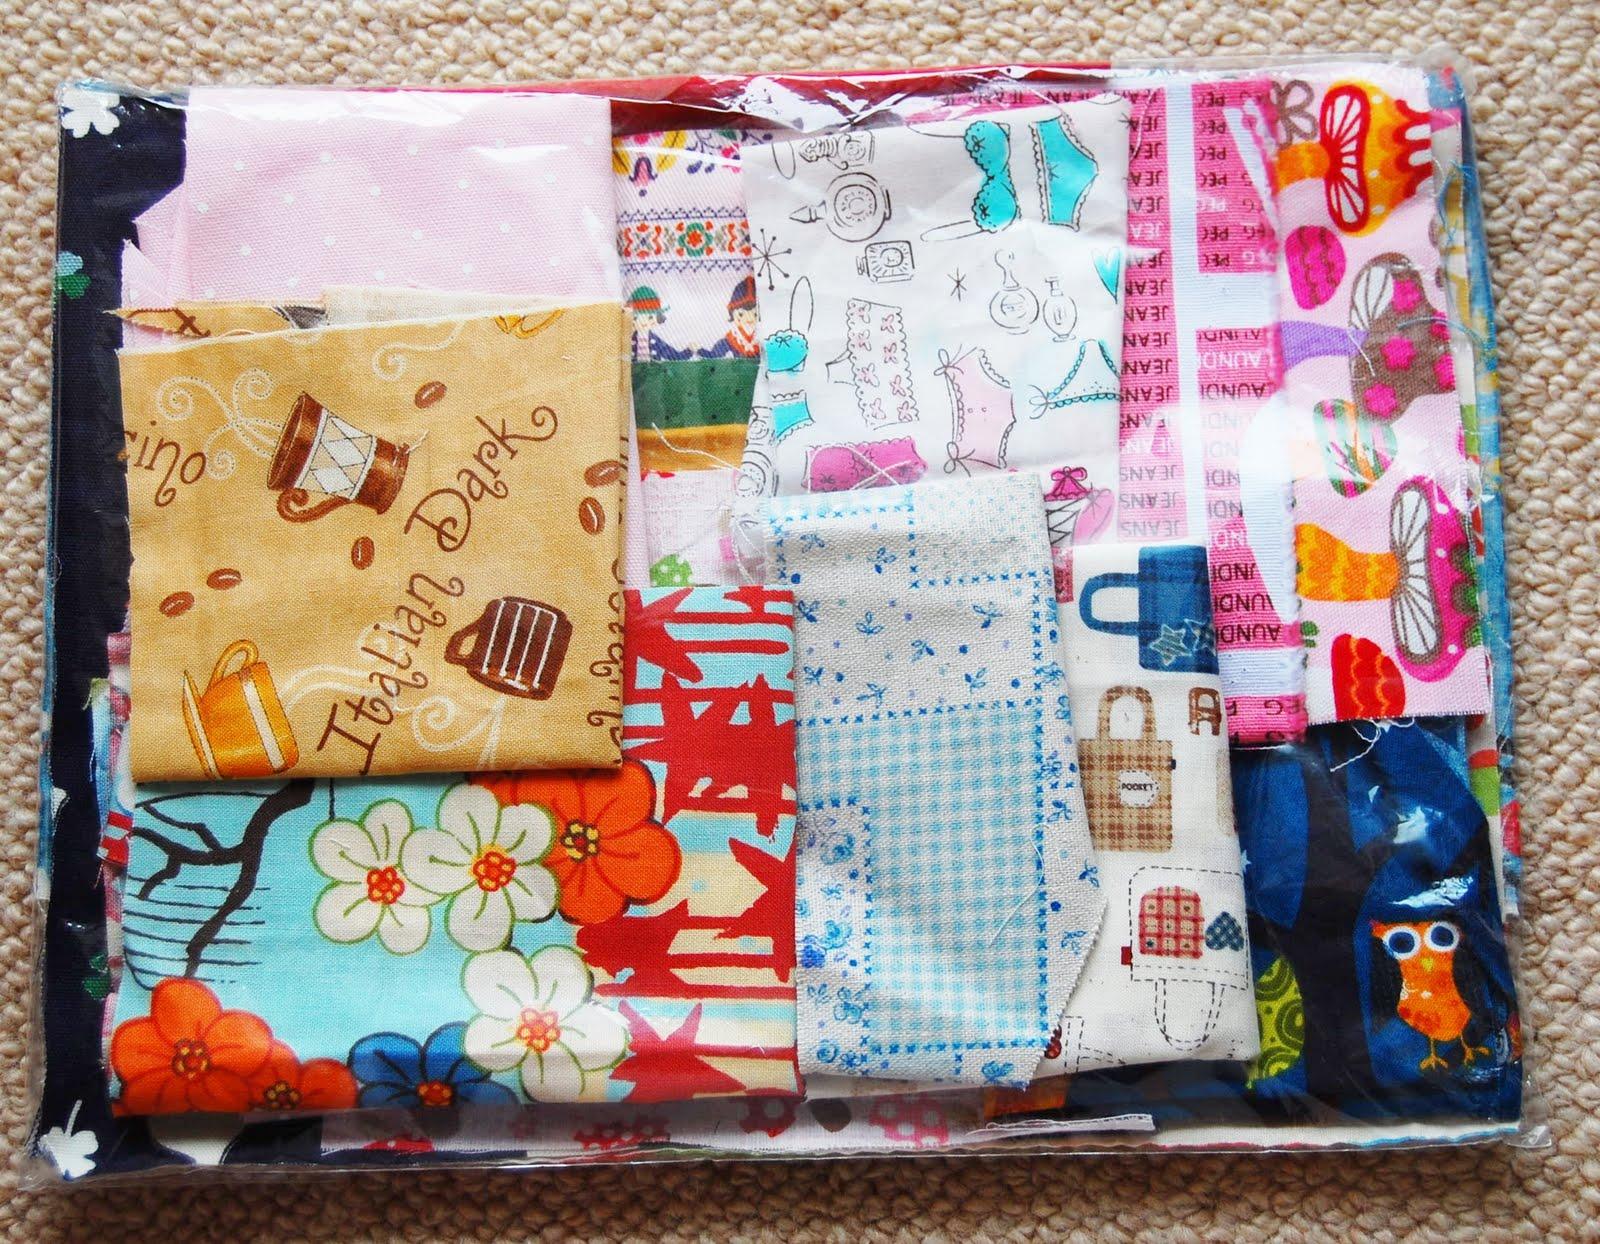 Mybotang fabric scrap series cards - Sb5 Back View